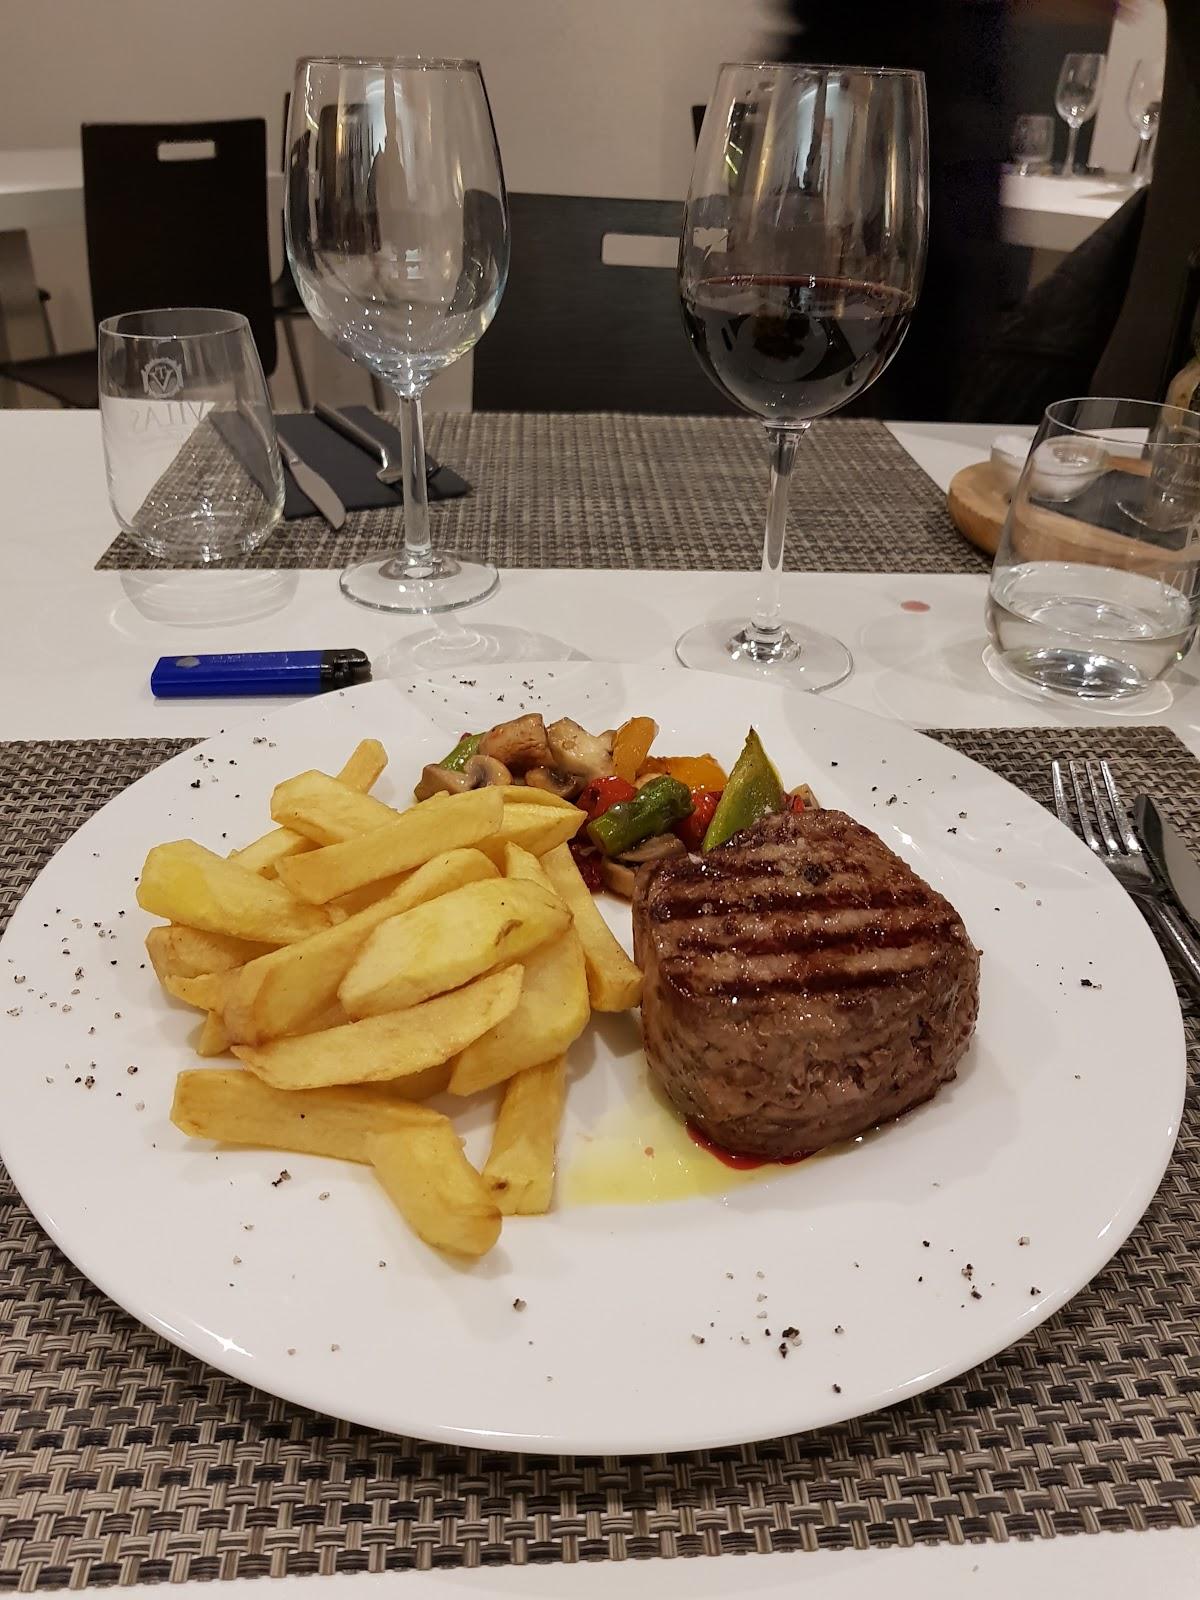 Caliuet Barestaurant